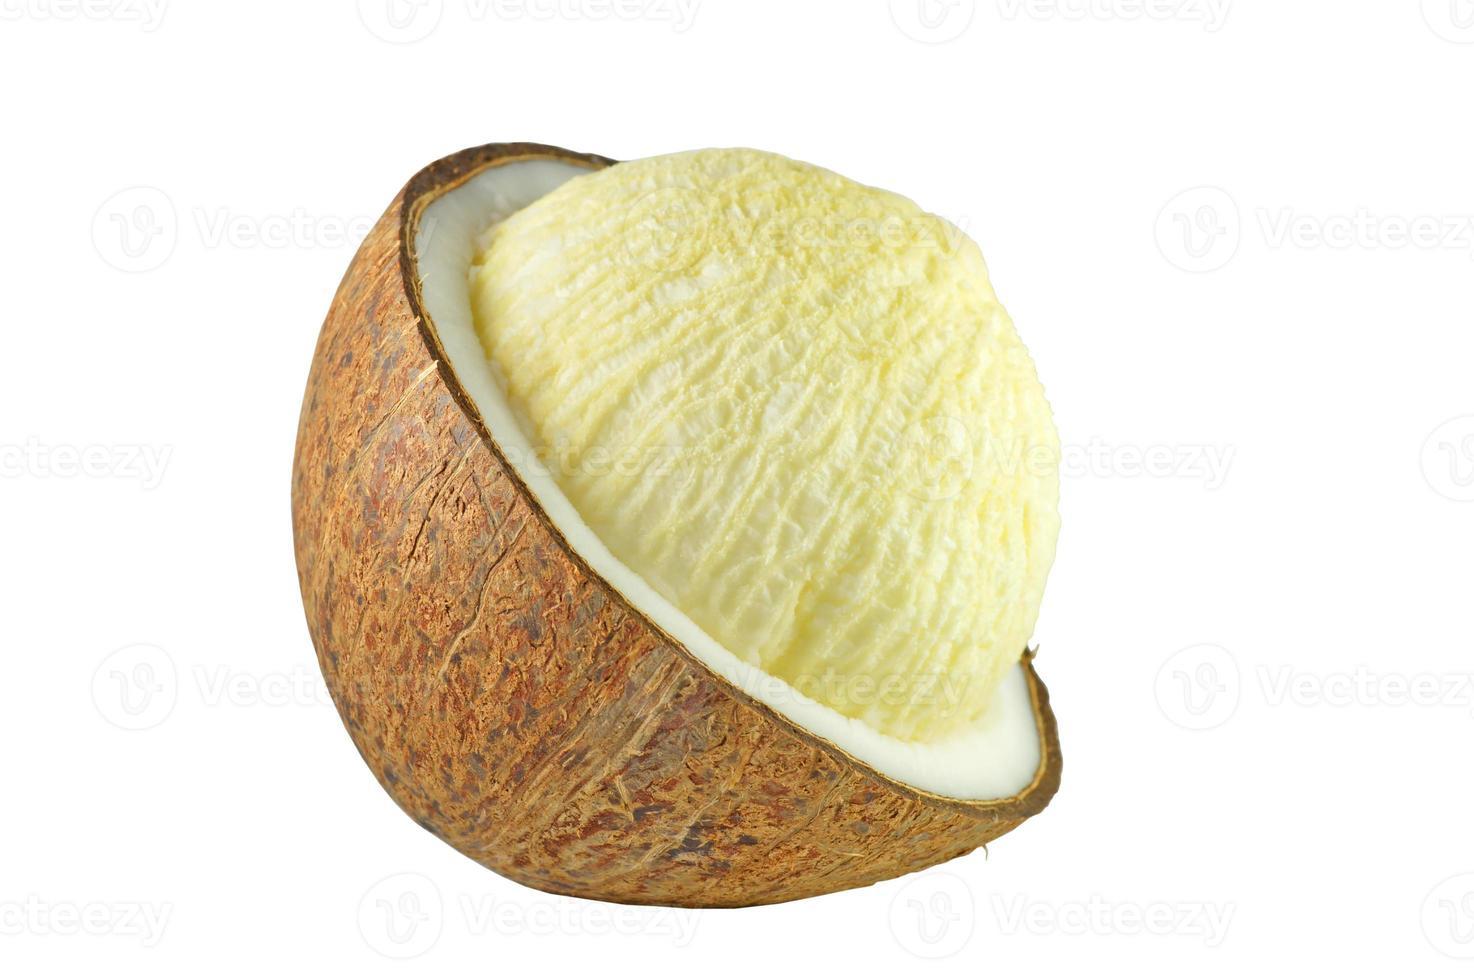 Embryo bud of coconut photo